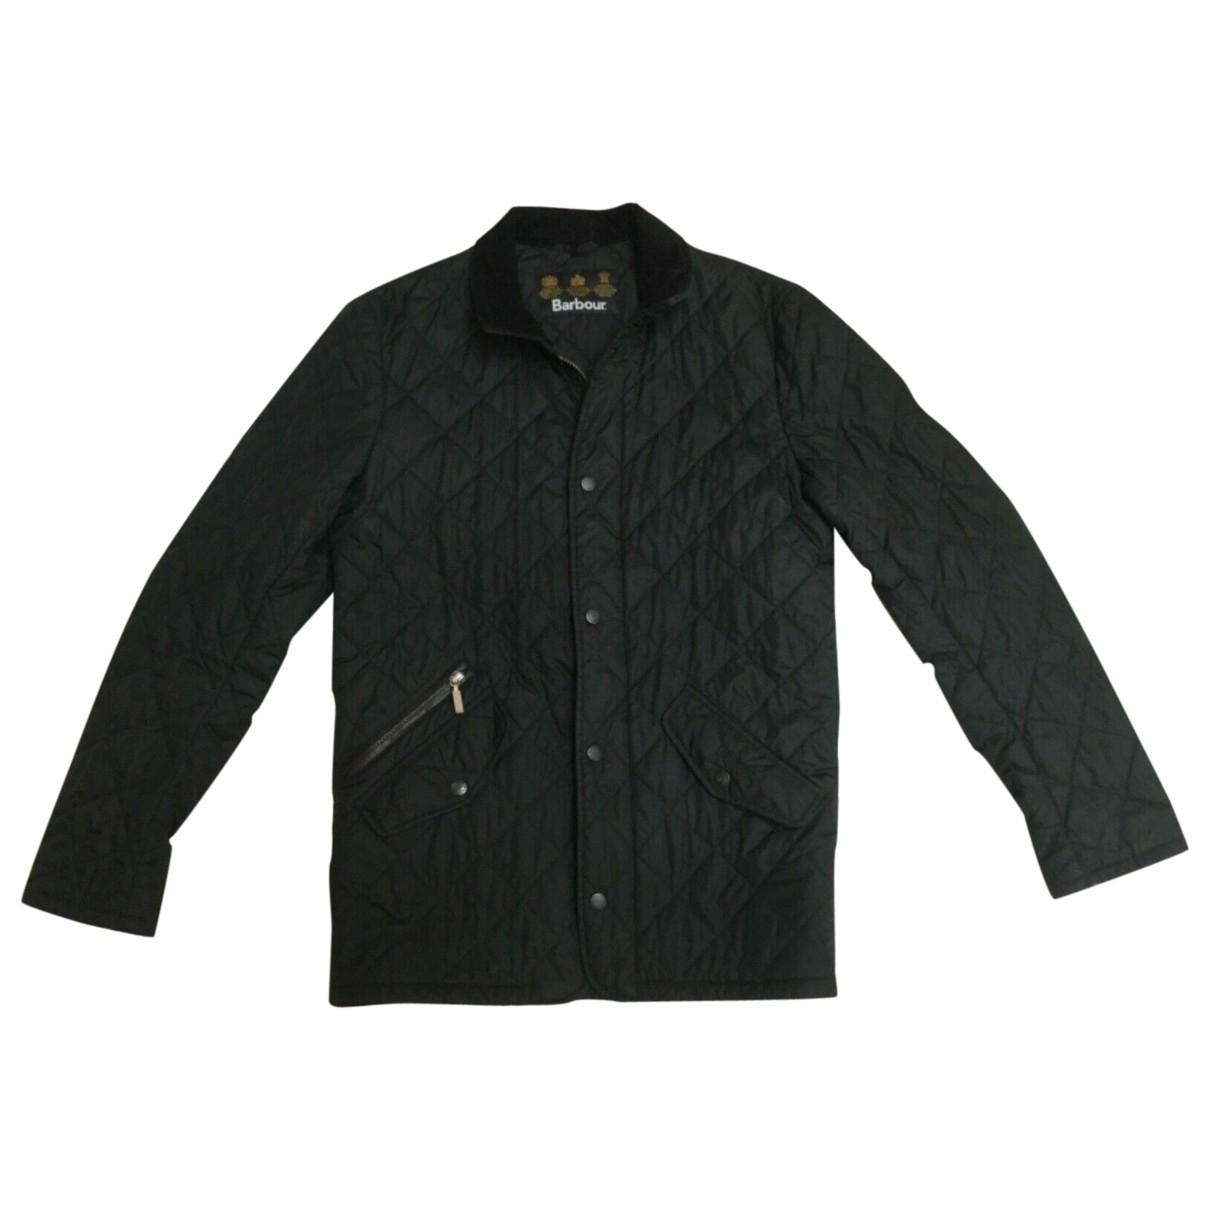 Barbour \N Jacke in  Schwarz Polyester